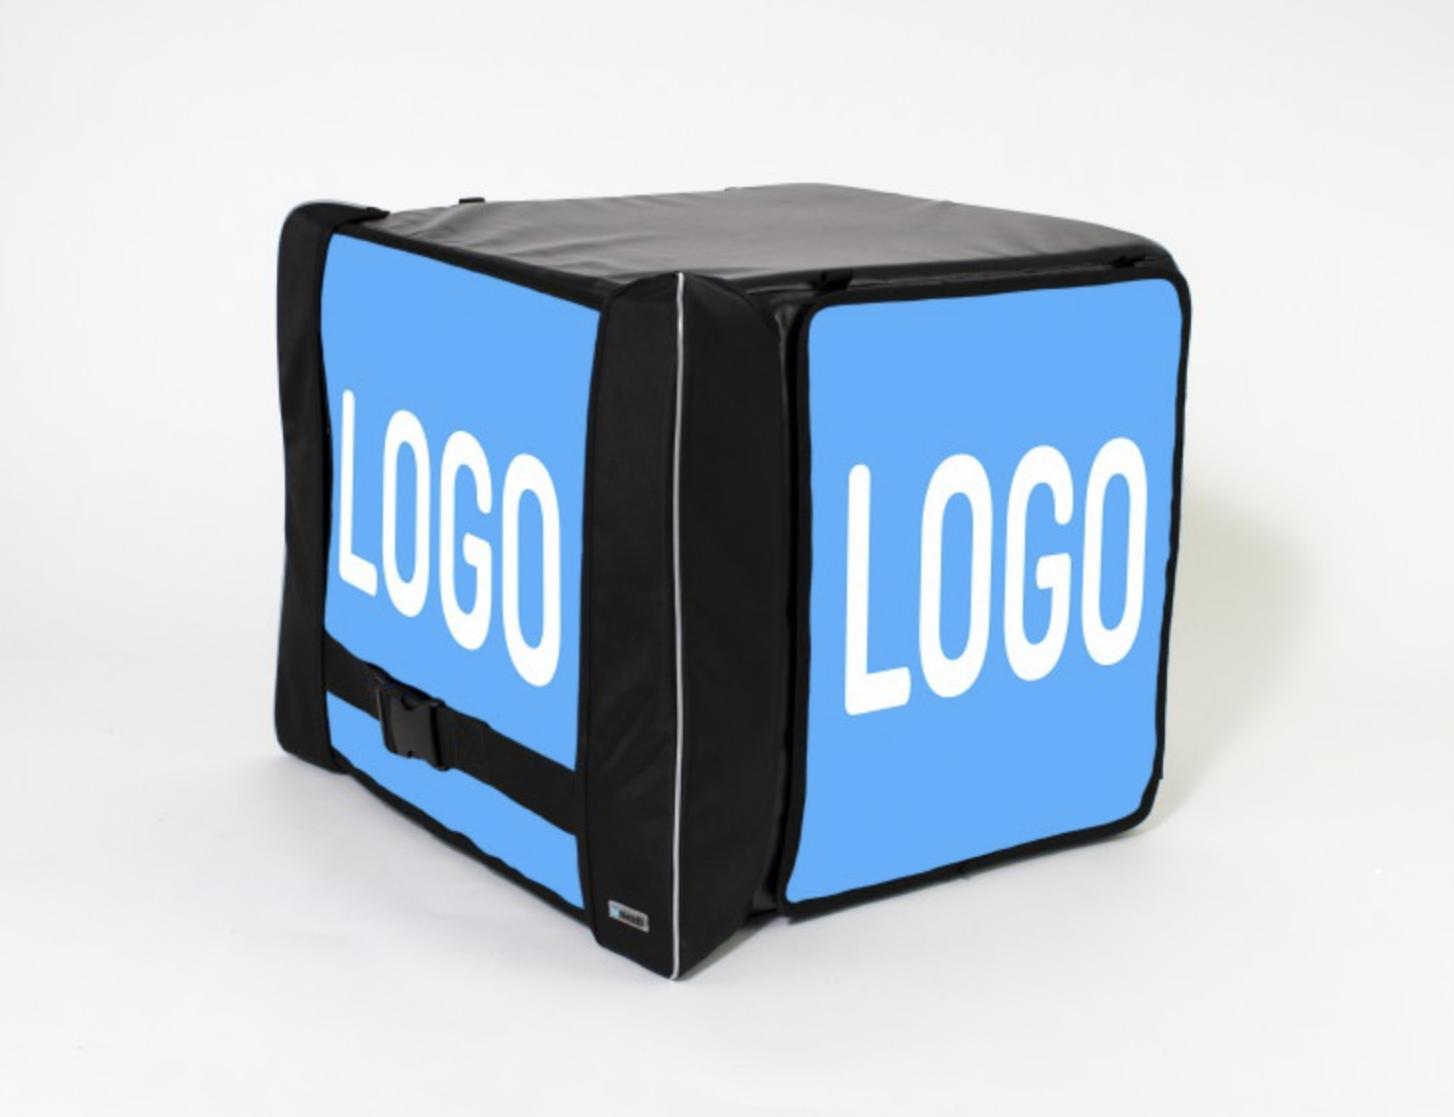 Thermobox 20L incl. Draagframe, scheidingsblad en montagemateriaal